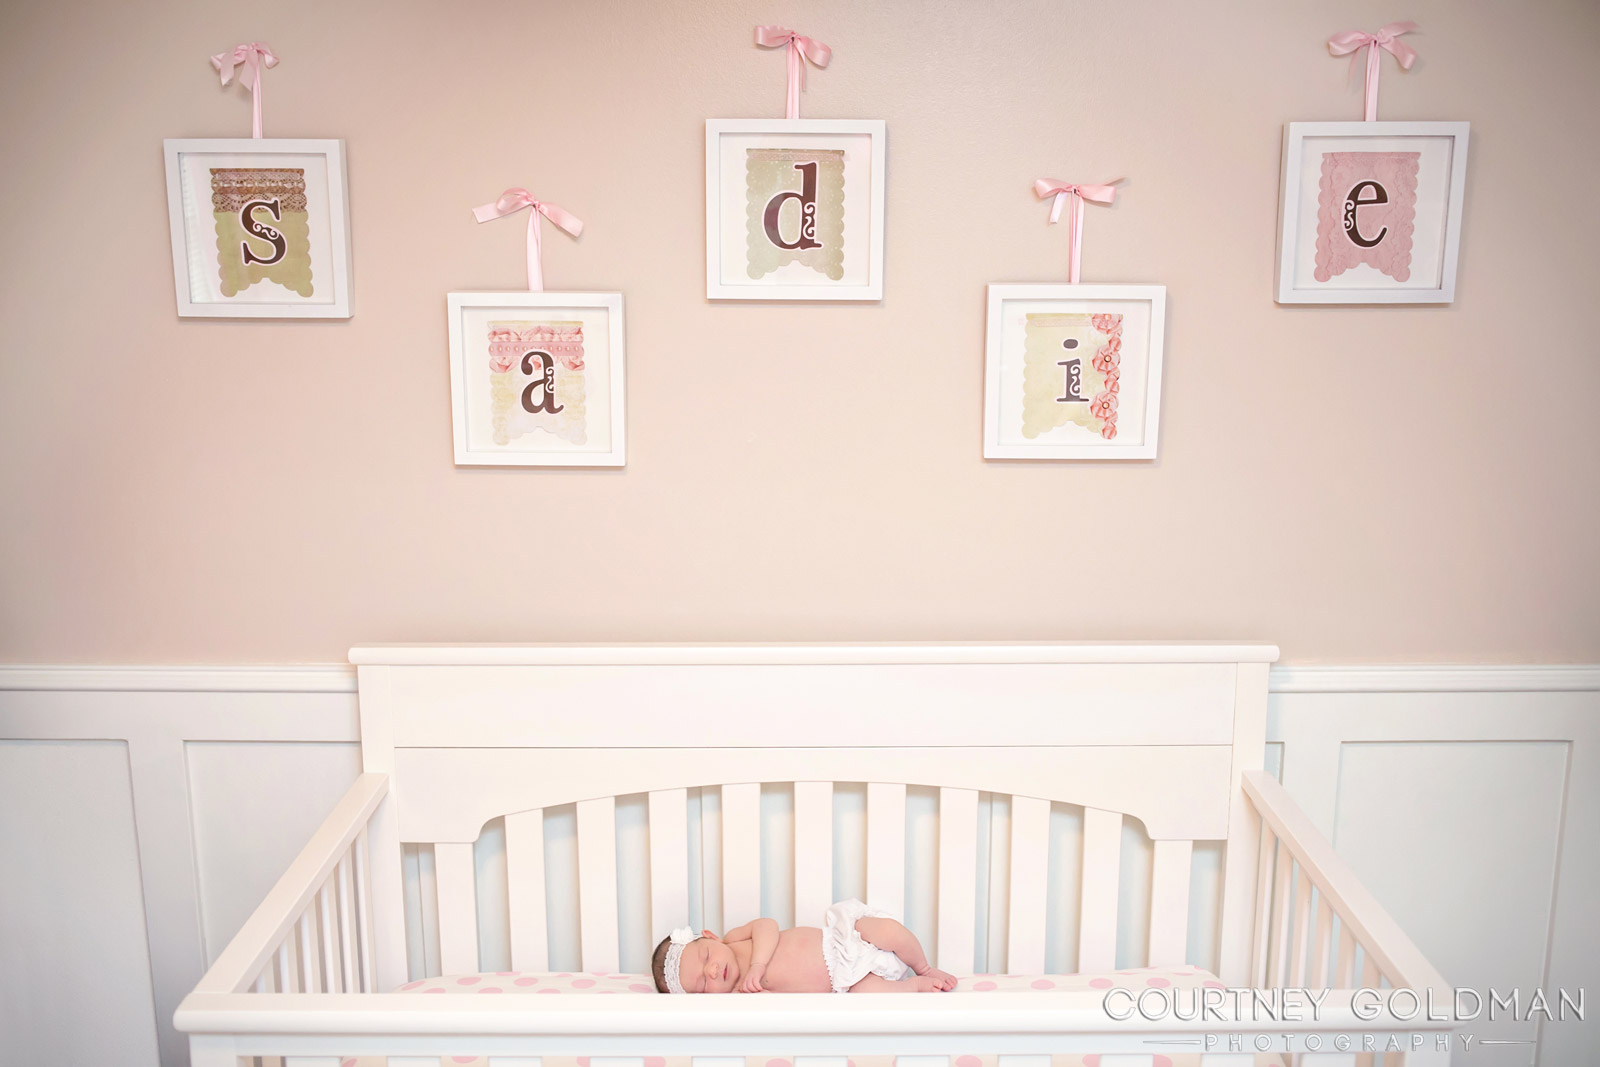 Atlanta Maternity and Newborn Photography by Courtney Goldman 07.jpg